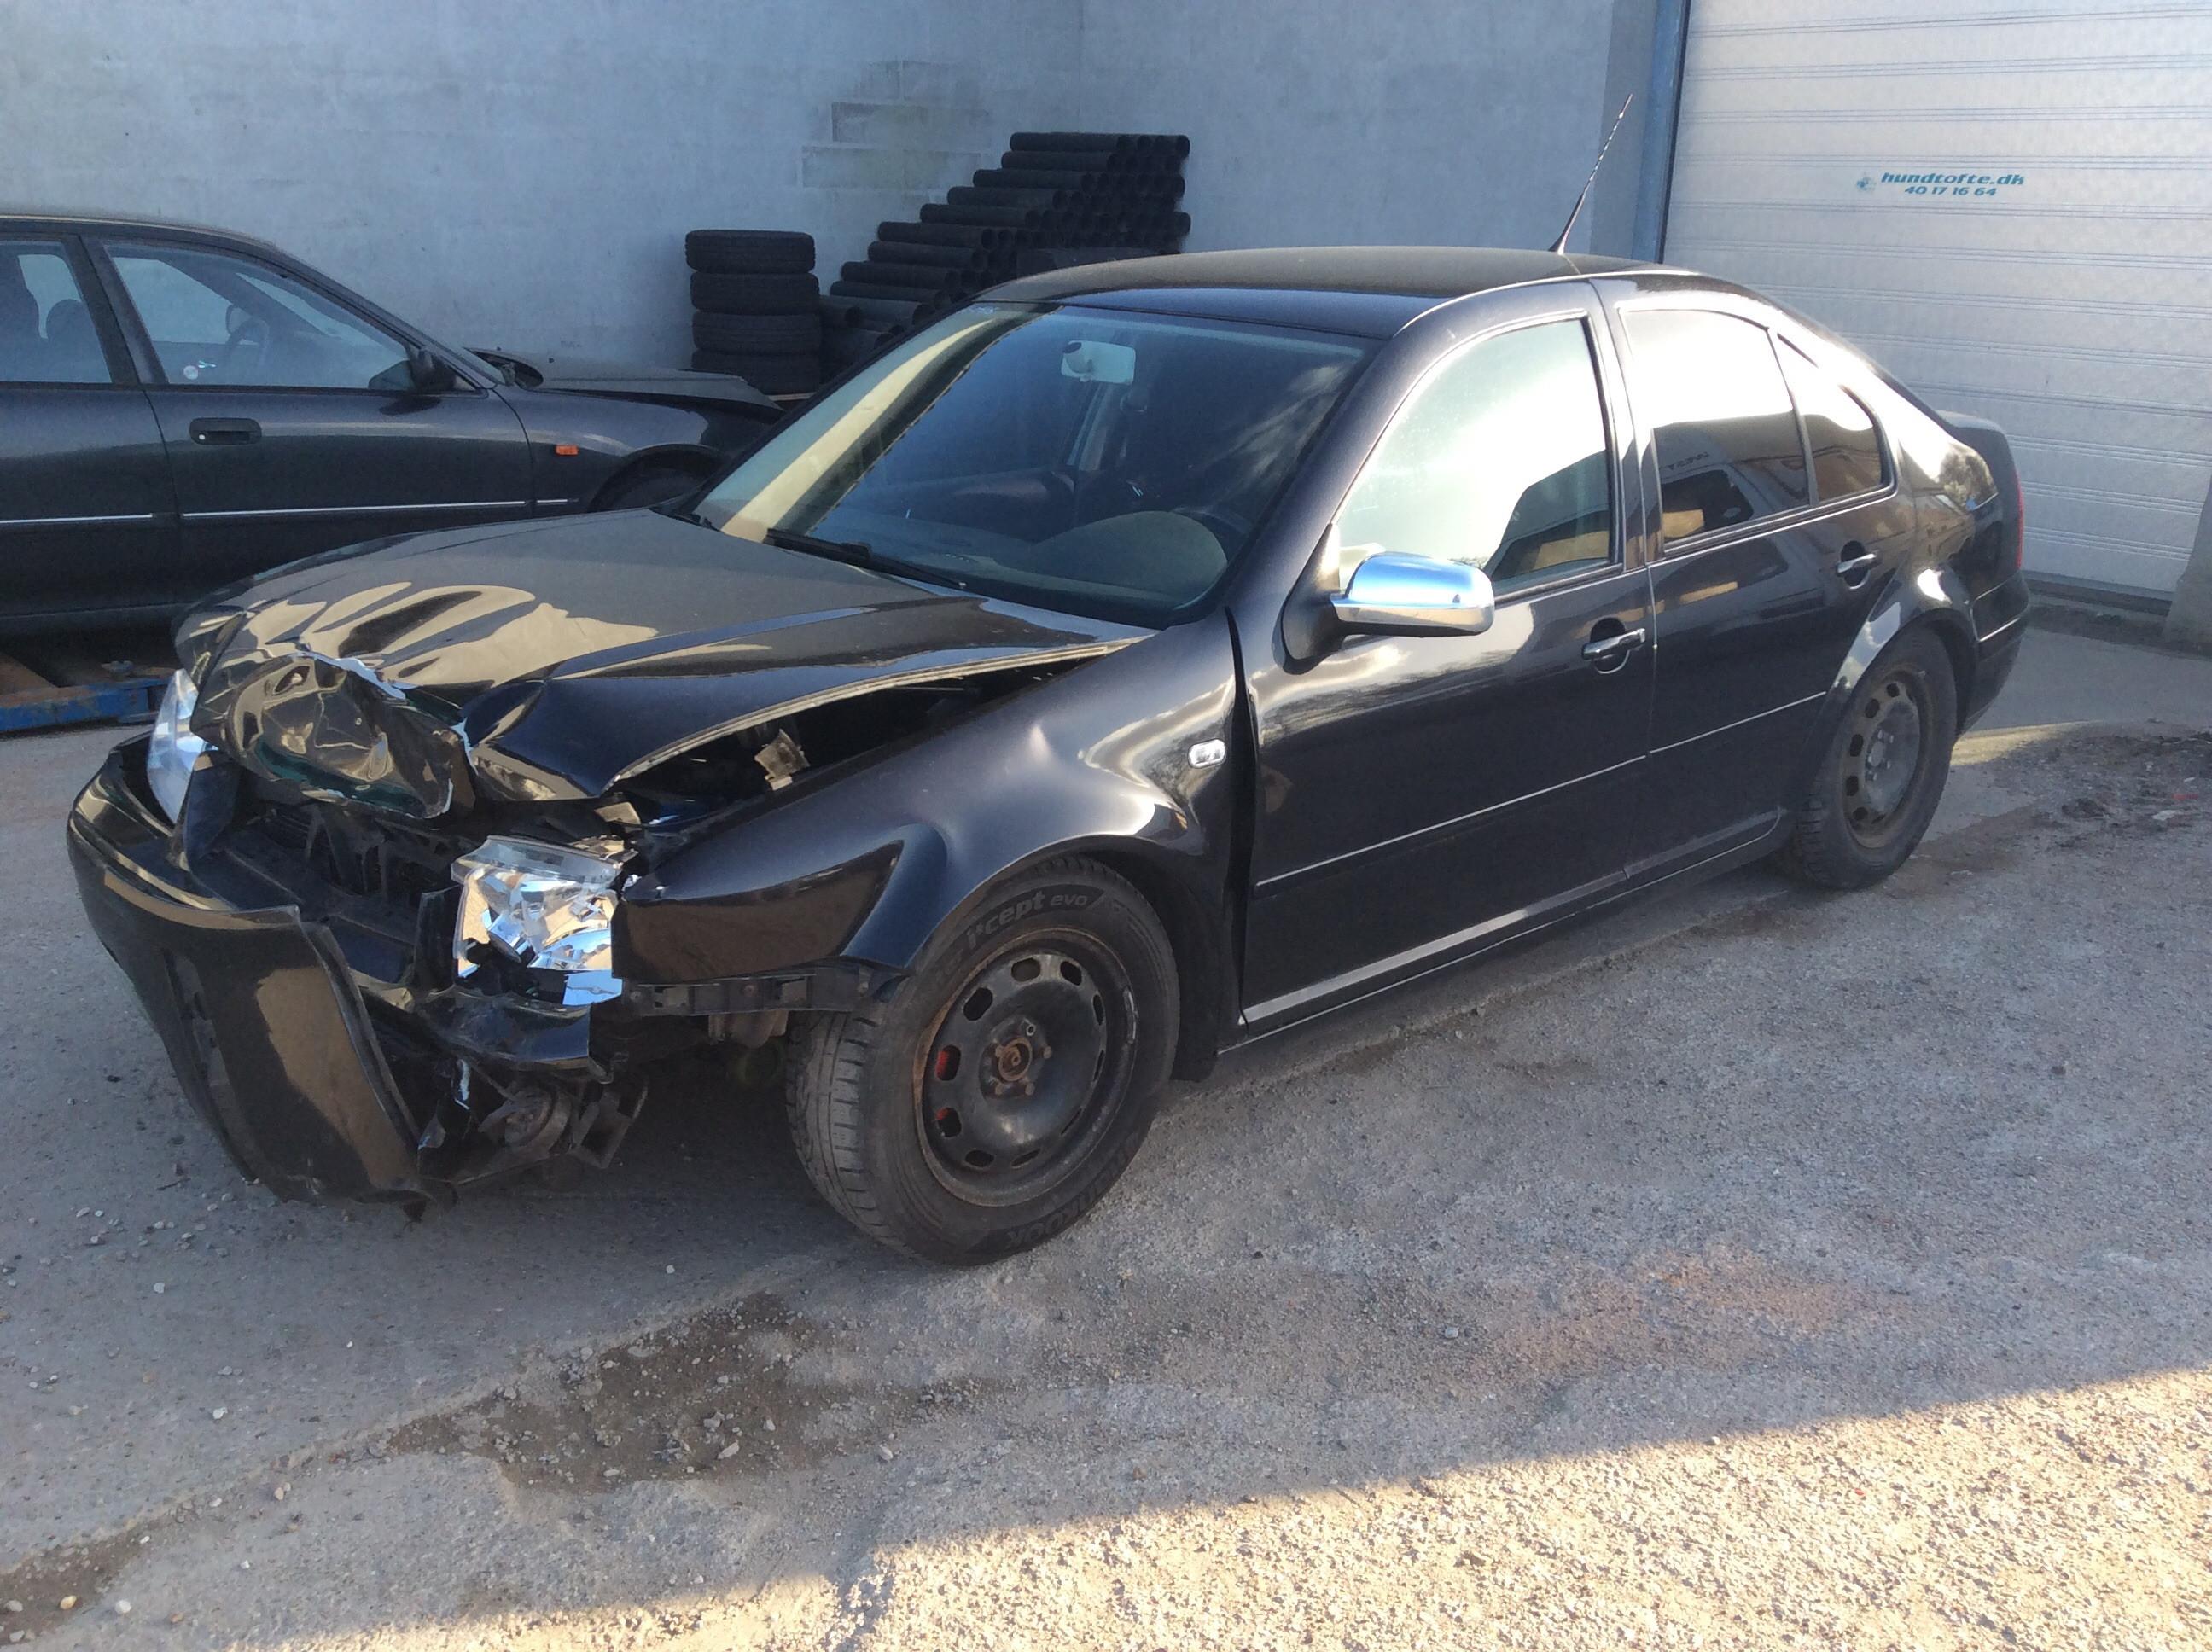 Reservedele,VW BORA 1,6 år 2000